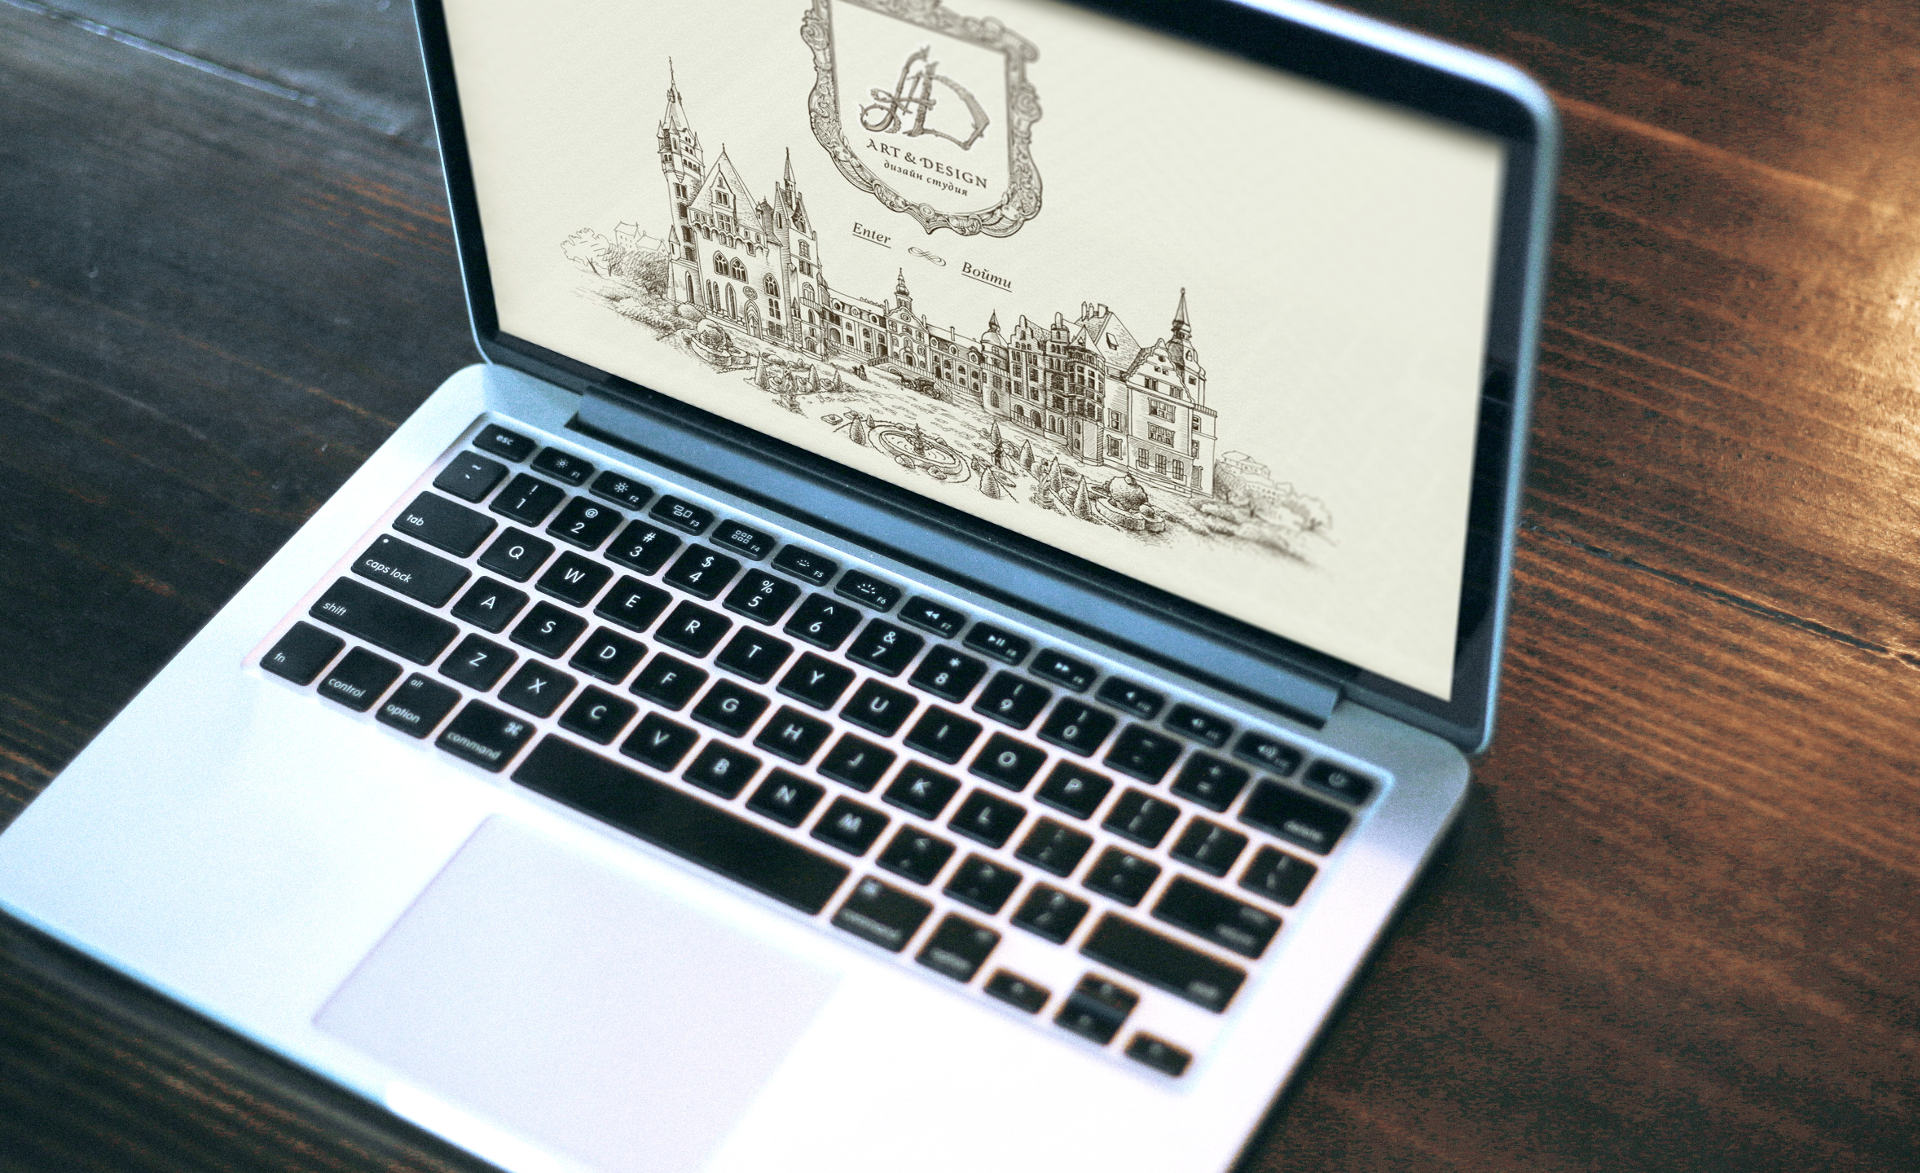 Разработка сайта архитектурного бюро, architecture bureau site development